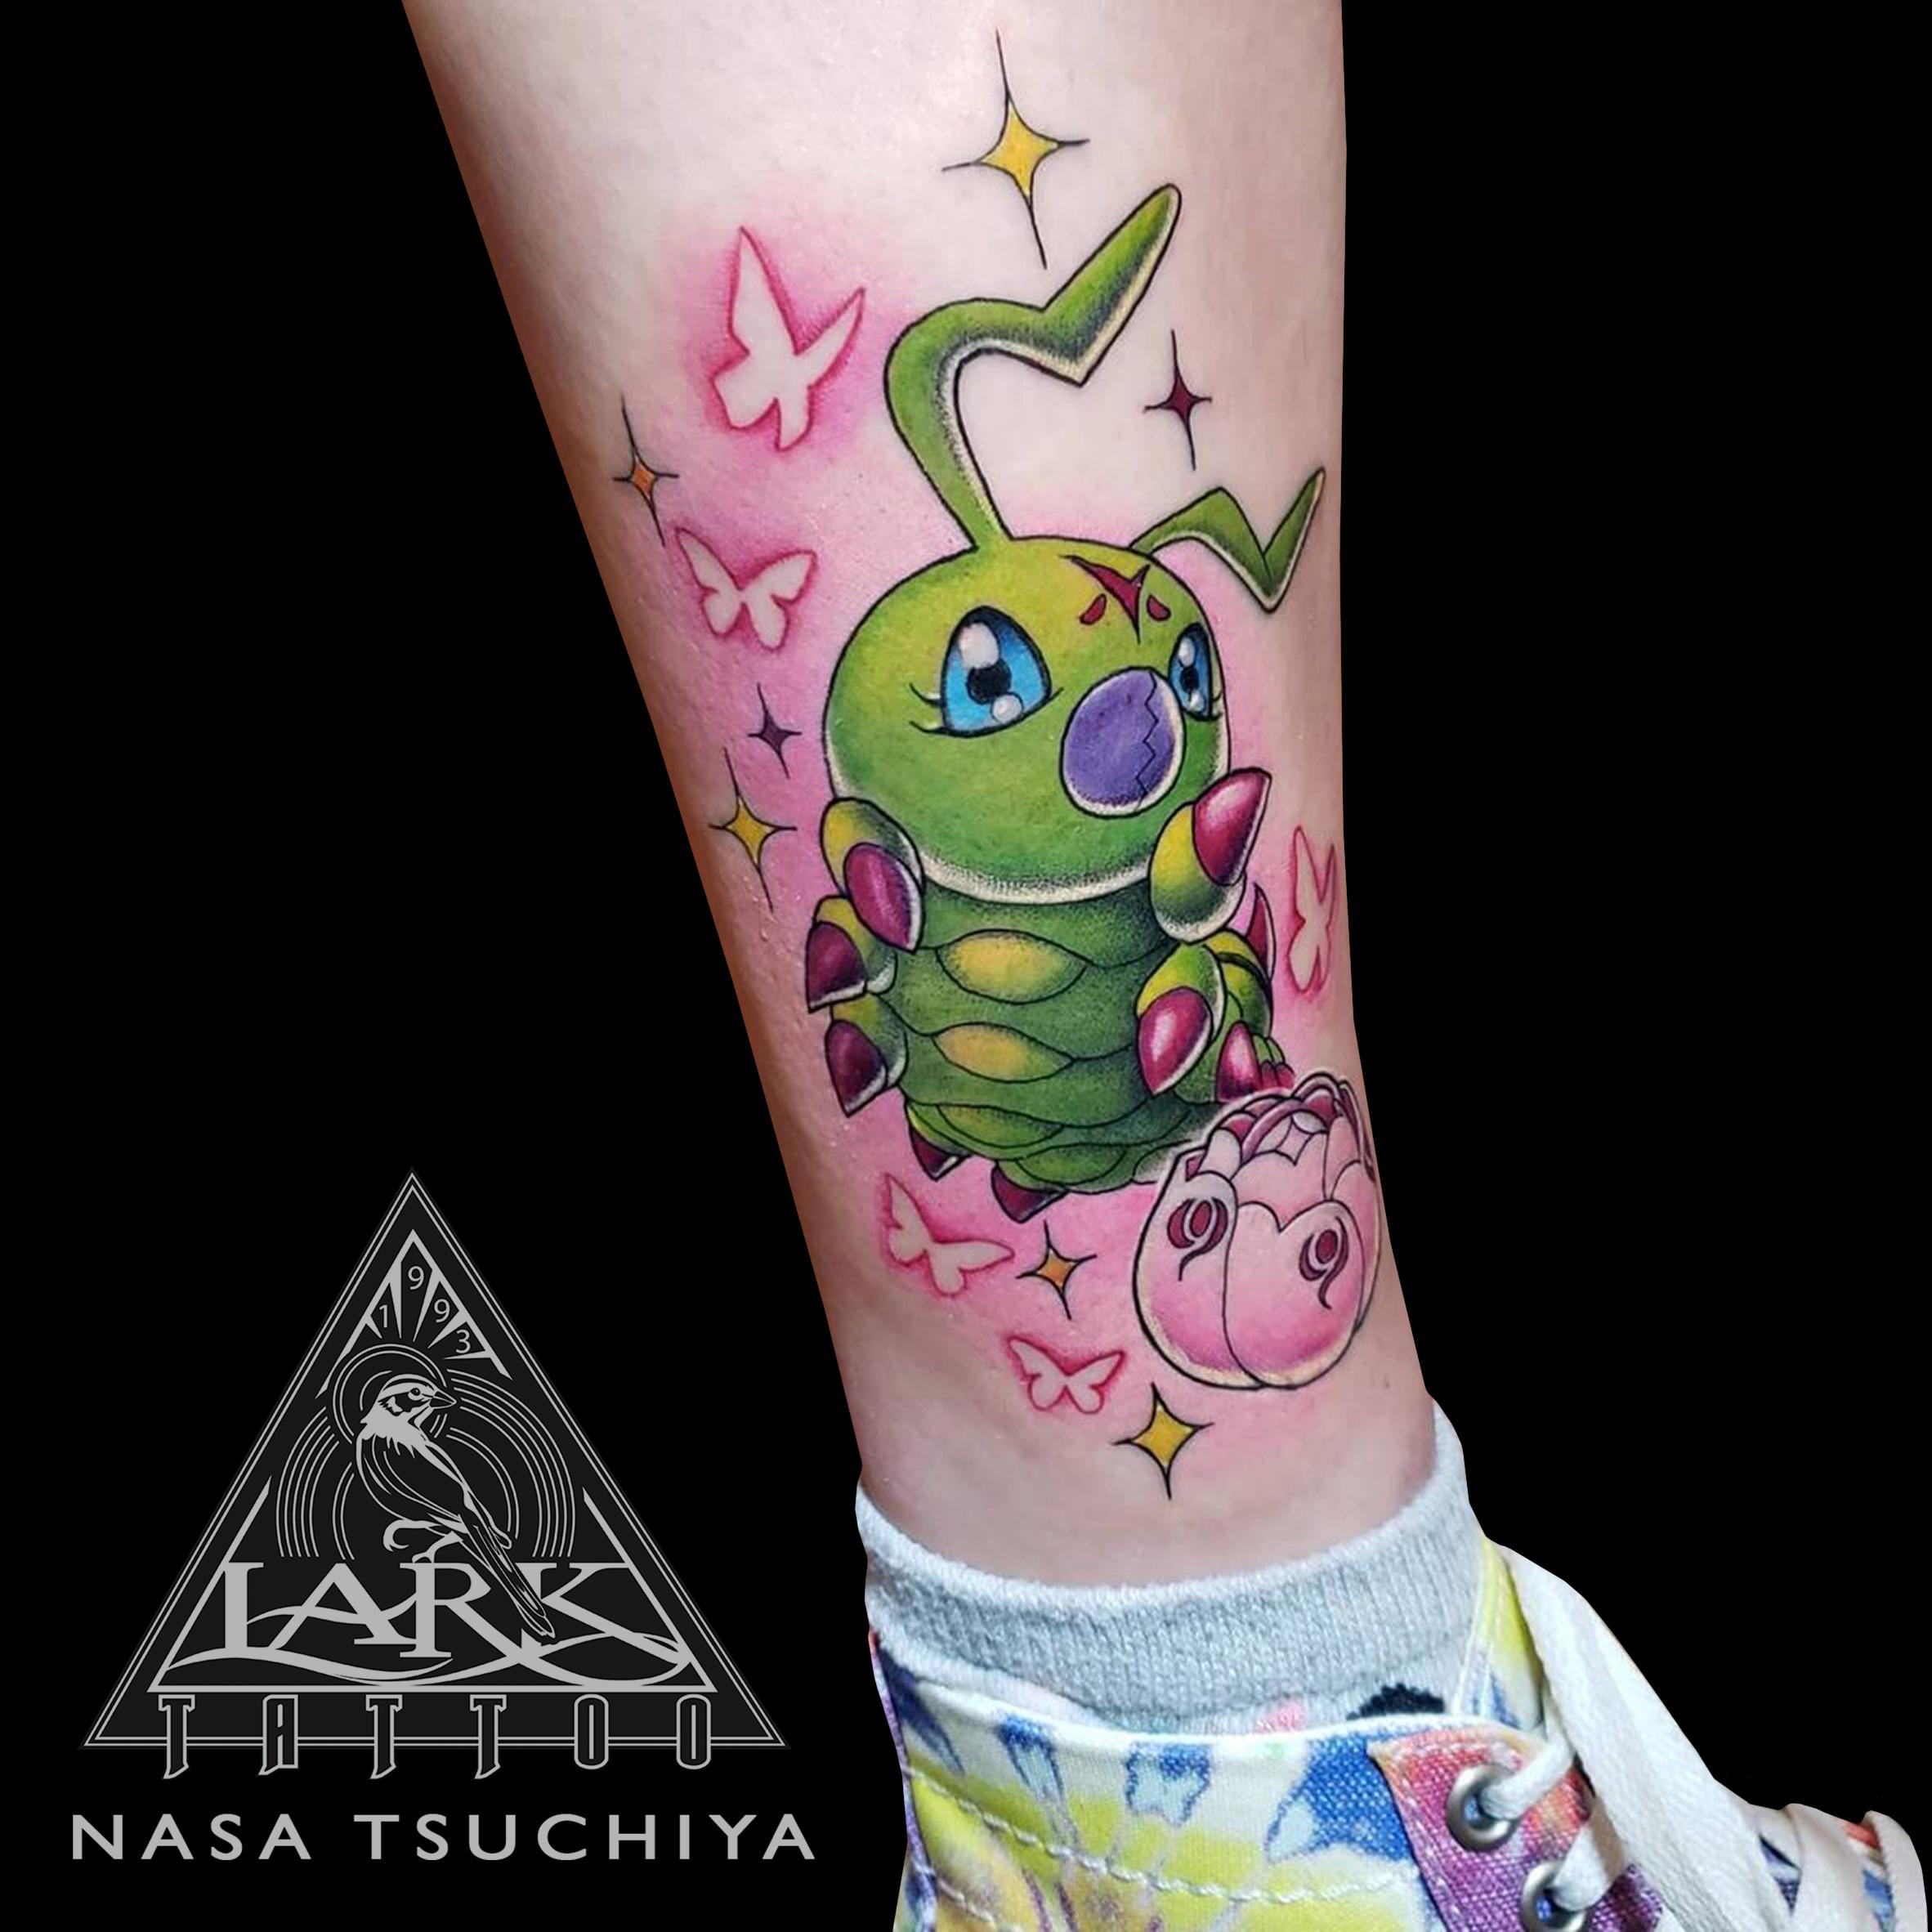 LarkTattoo, Tattoo, NasaTsuchiya, NasaTsuchiyaLarkTattoo, Tattoos, FemaleTattooer, FemaleArtist, LadyTattooer, Digimon, DigimonTattoo, Wormmon, WormmonTattoo, LarvaDigimon, LarvaDigimonTattoo, ワームモン, Anime, AnimeTattoo, ColorTattoo, DigimonAdventures, DigimonAdventuresTattoo, Otaku, OtakuTattoo, Kawaii, KawaiiTattoo, CuteTattoo, TattooArtist, Tattoist, Tattooer, LongIslandTattooArtist, LongIslandTattooer, LongIslandTattoo, TattooOfTheDay, Tat, Tats, Tatts, Tatted, Inked, Ink, TattooInk, AmazingInk, AmazingTattoo, BodyArt, LarkTattooWestbury, Westbury, LongIsland, NY, NewYork, USA, Art, Tattedup, InkedUp, LarkTattoos